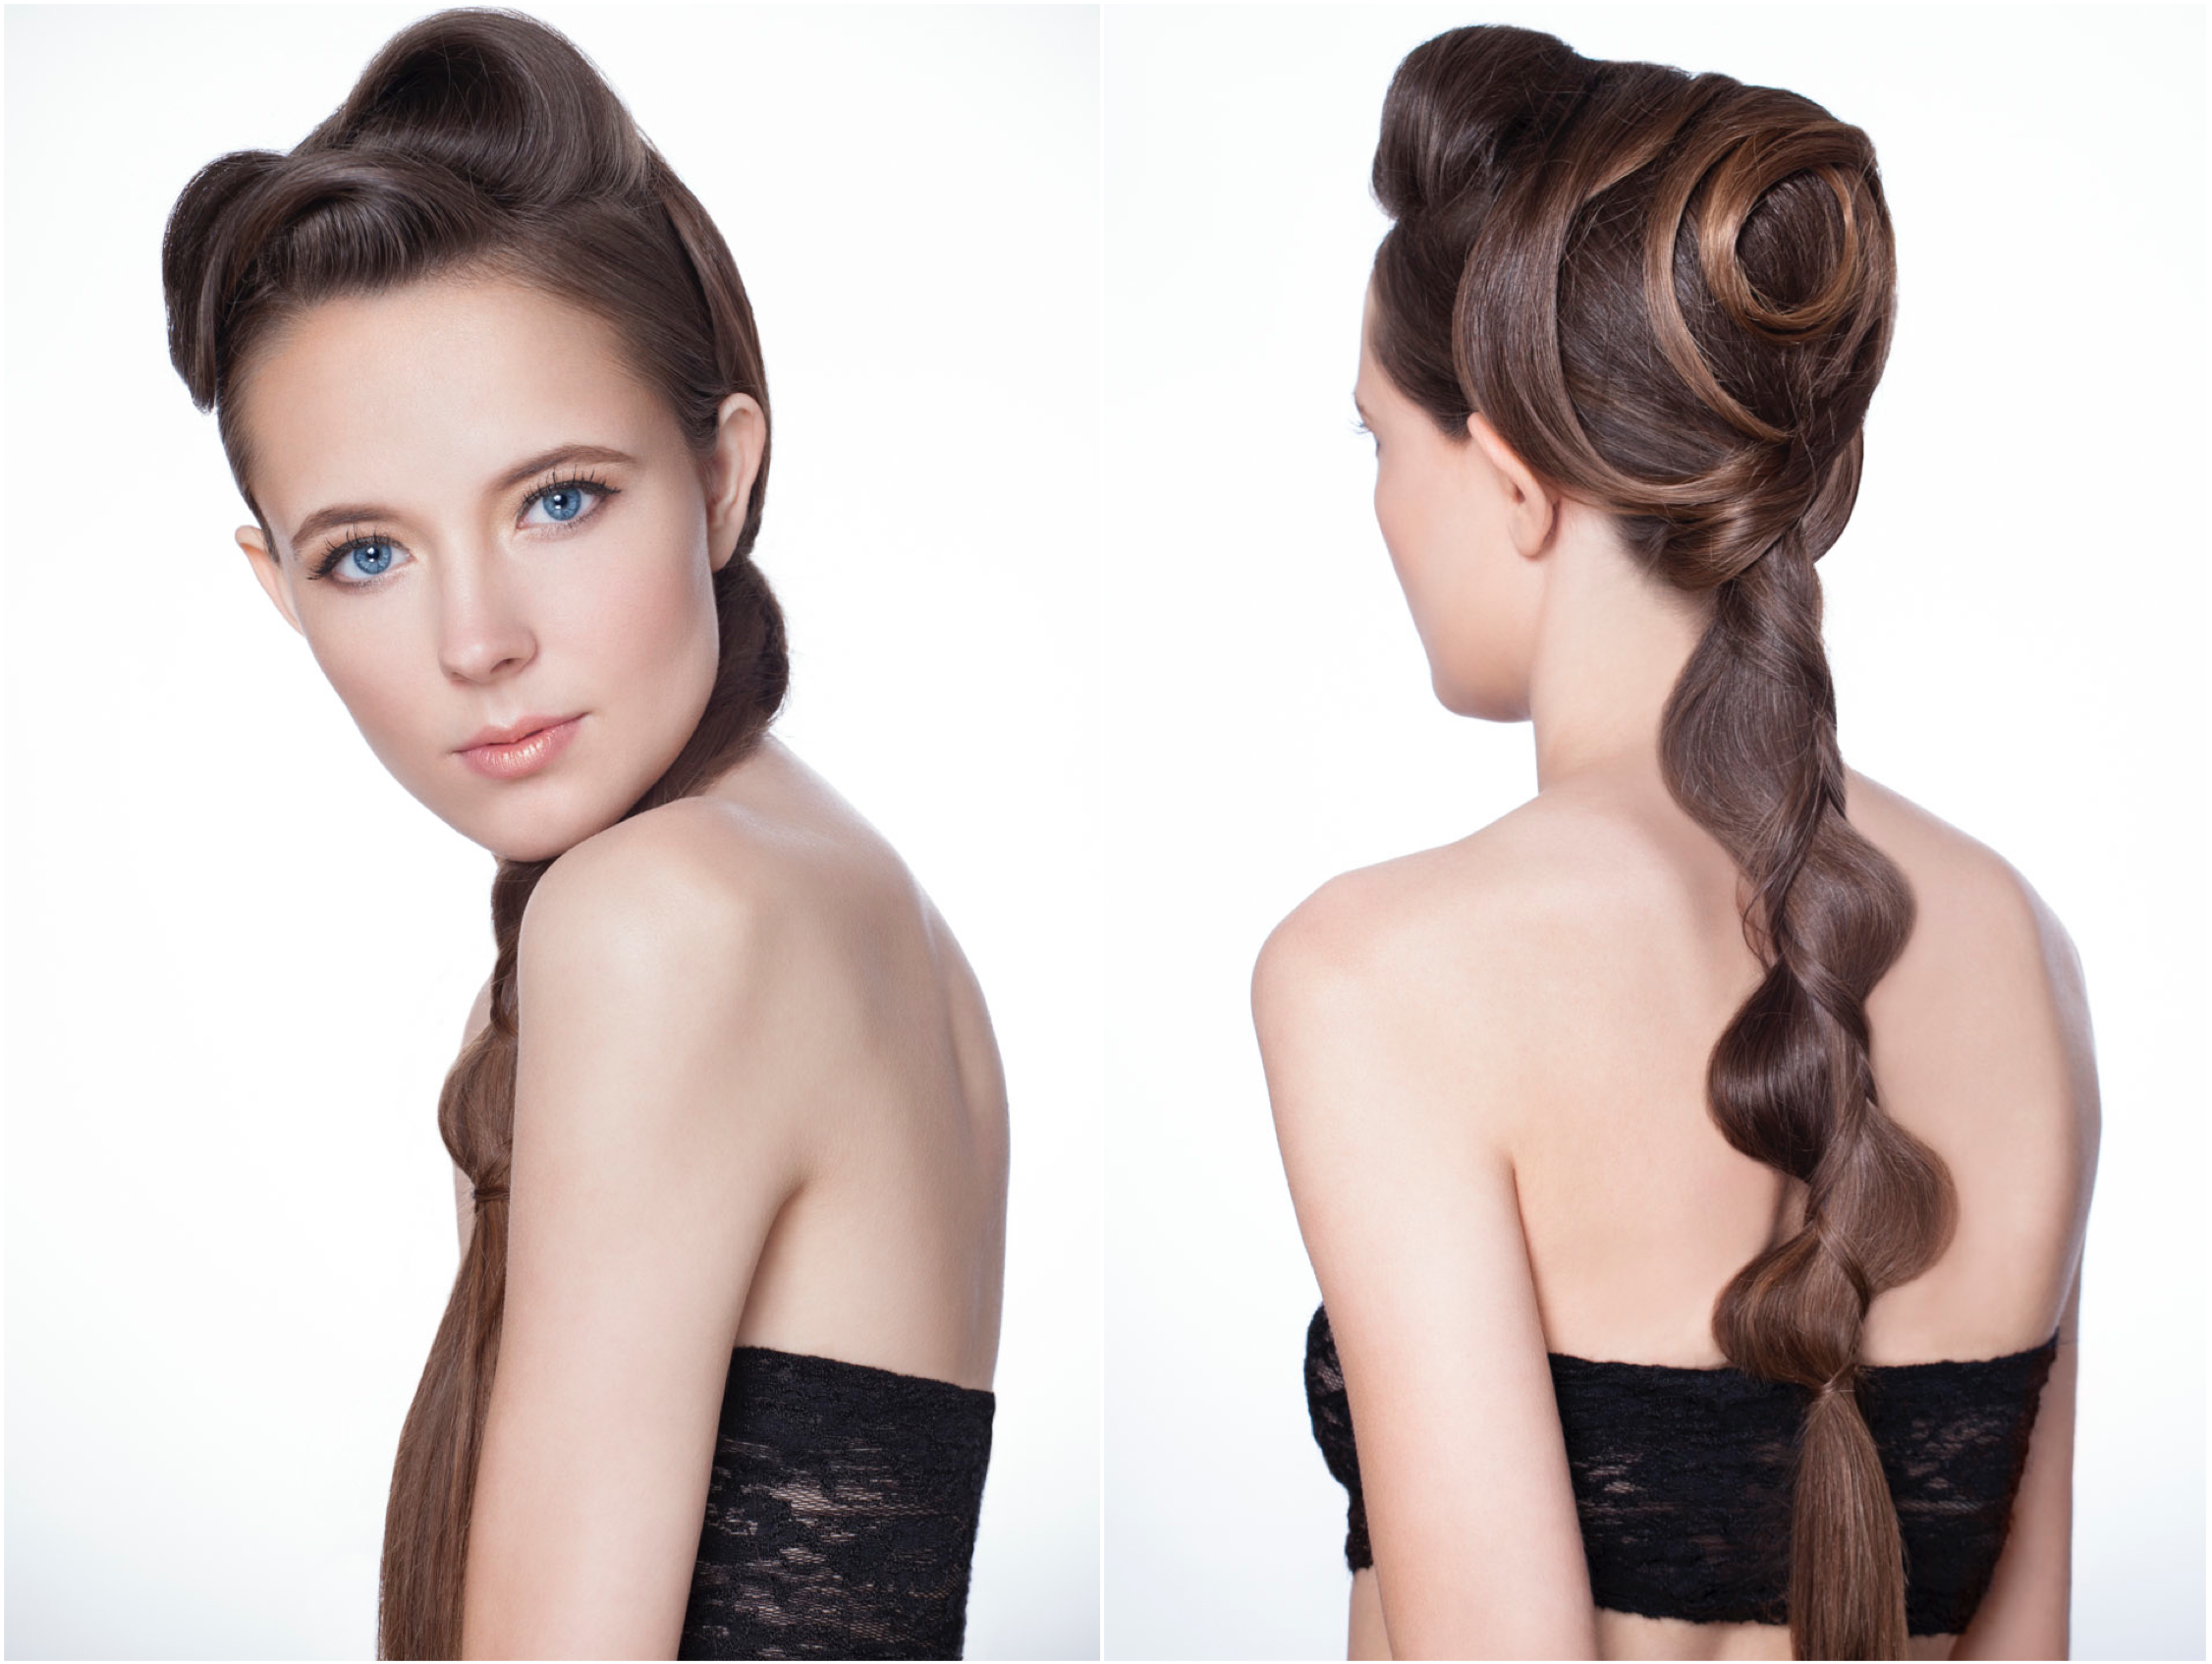 Model Margaryta Midenko